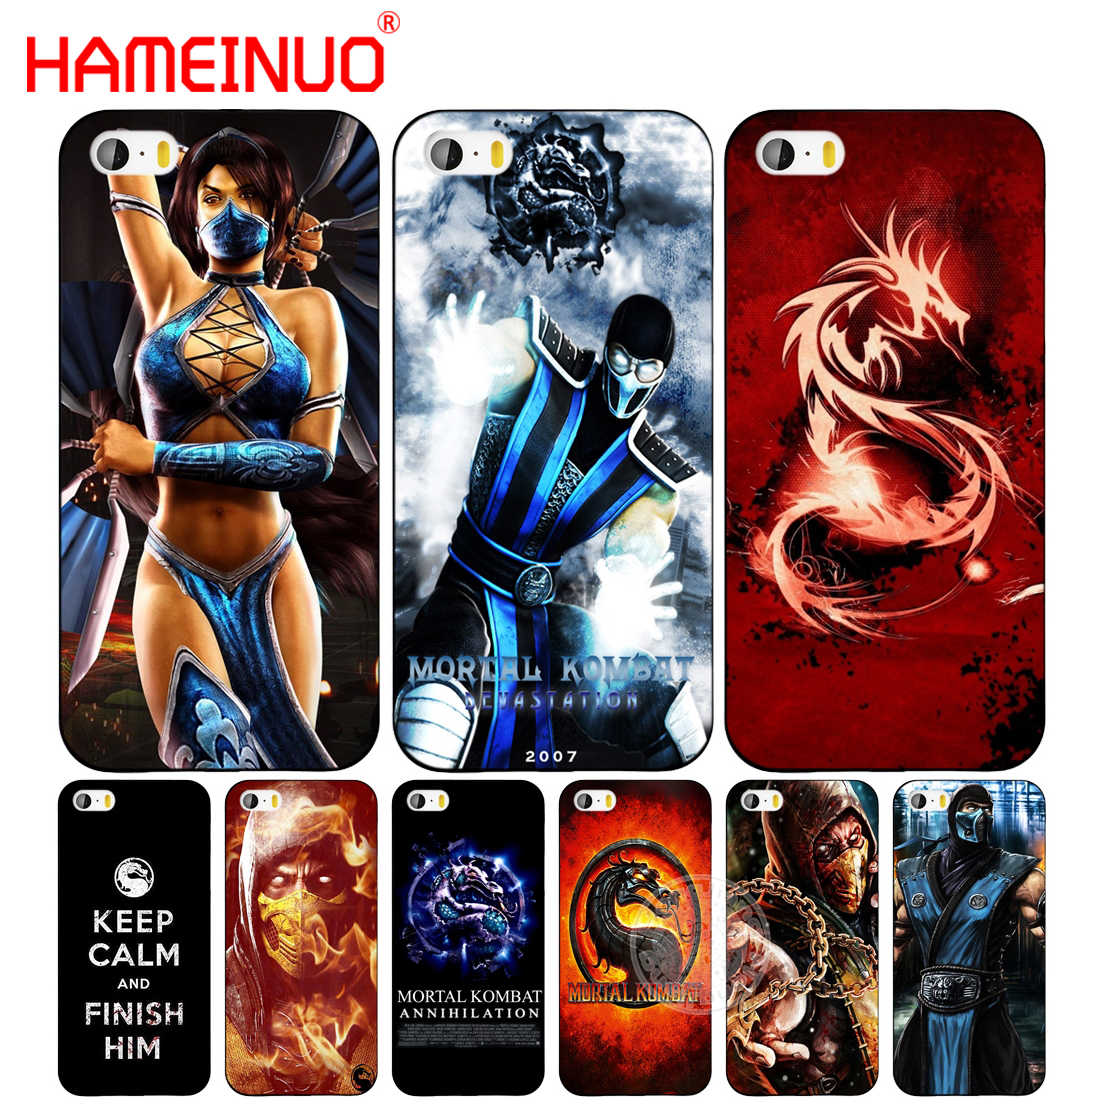 Hameinuo Scorpion Sub Zero Mortal Kombat X Cell Phone Cover